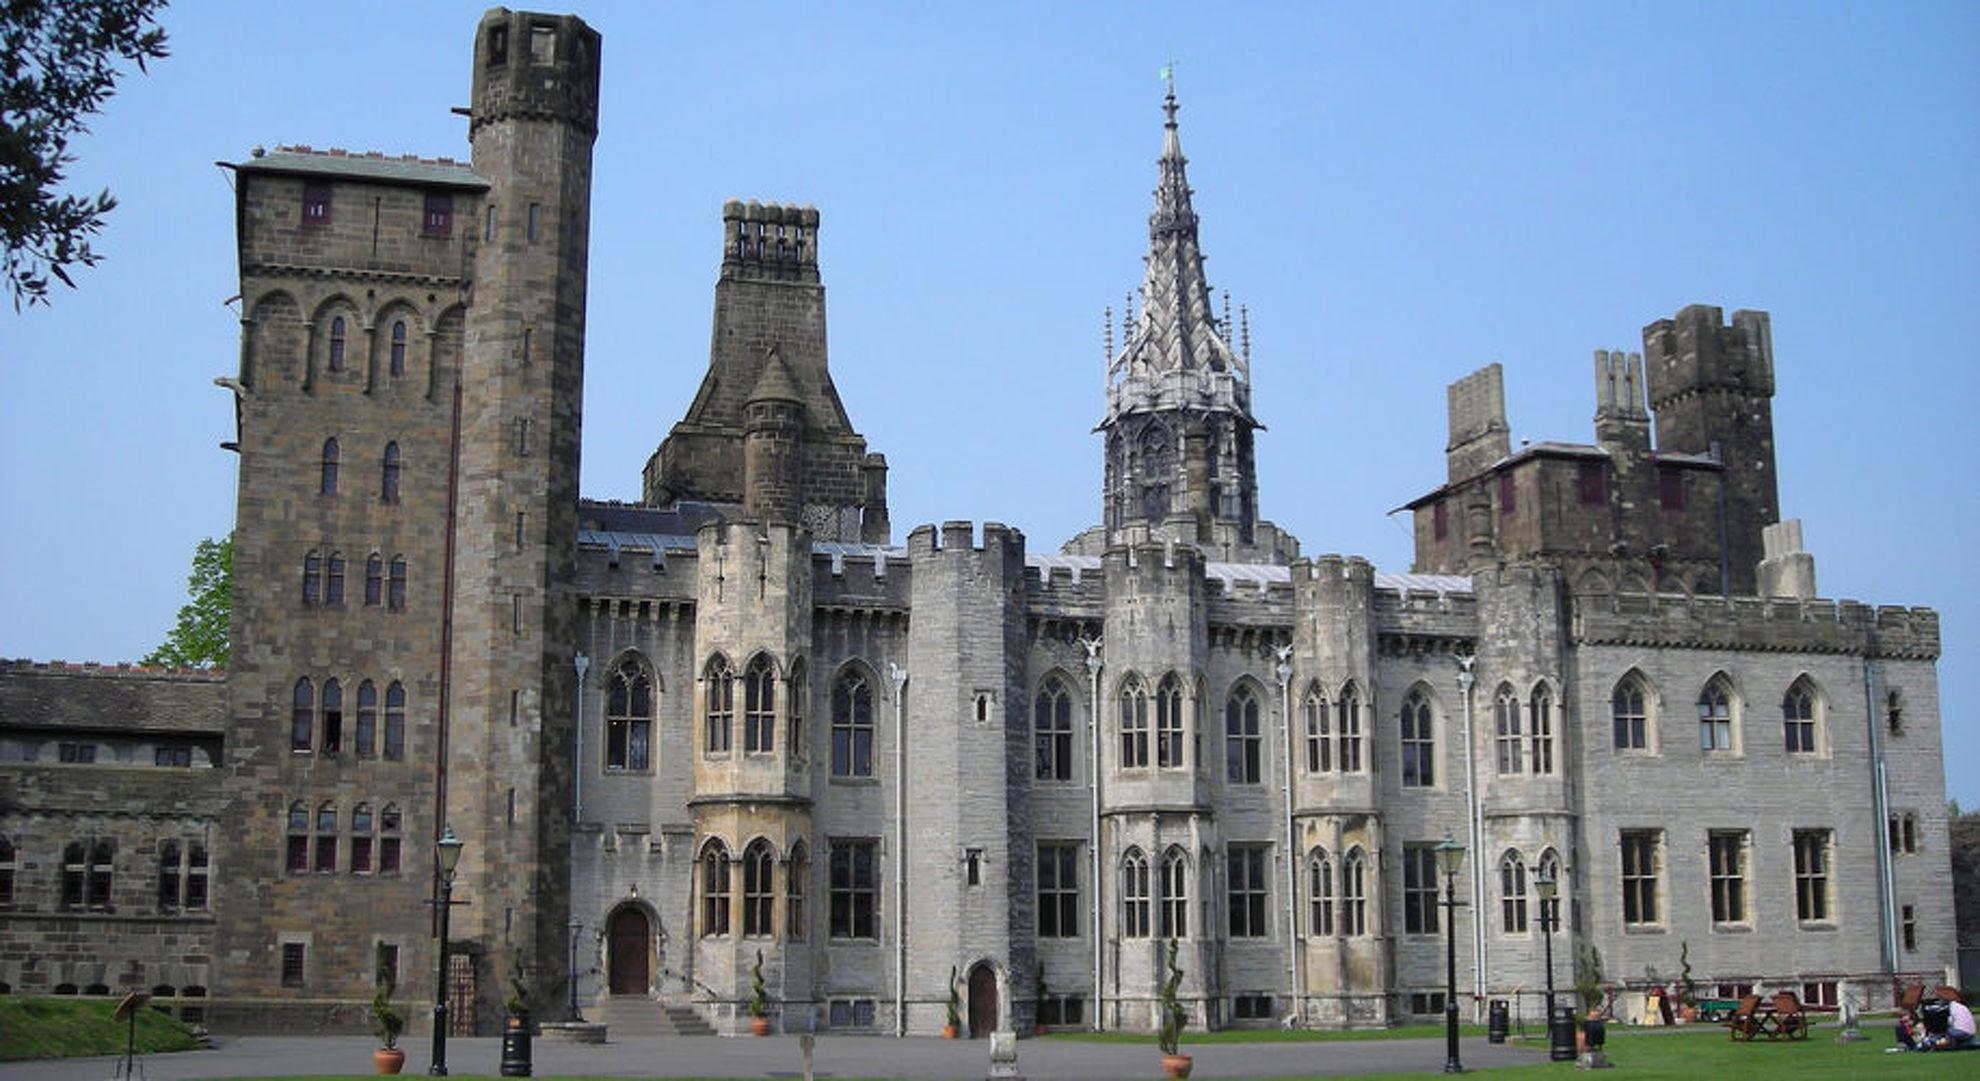 Explore Cardiff Castle